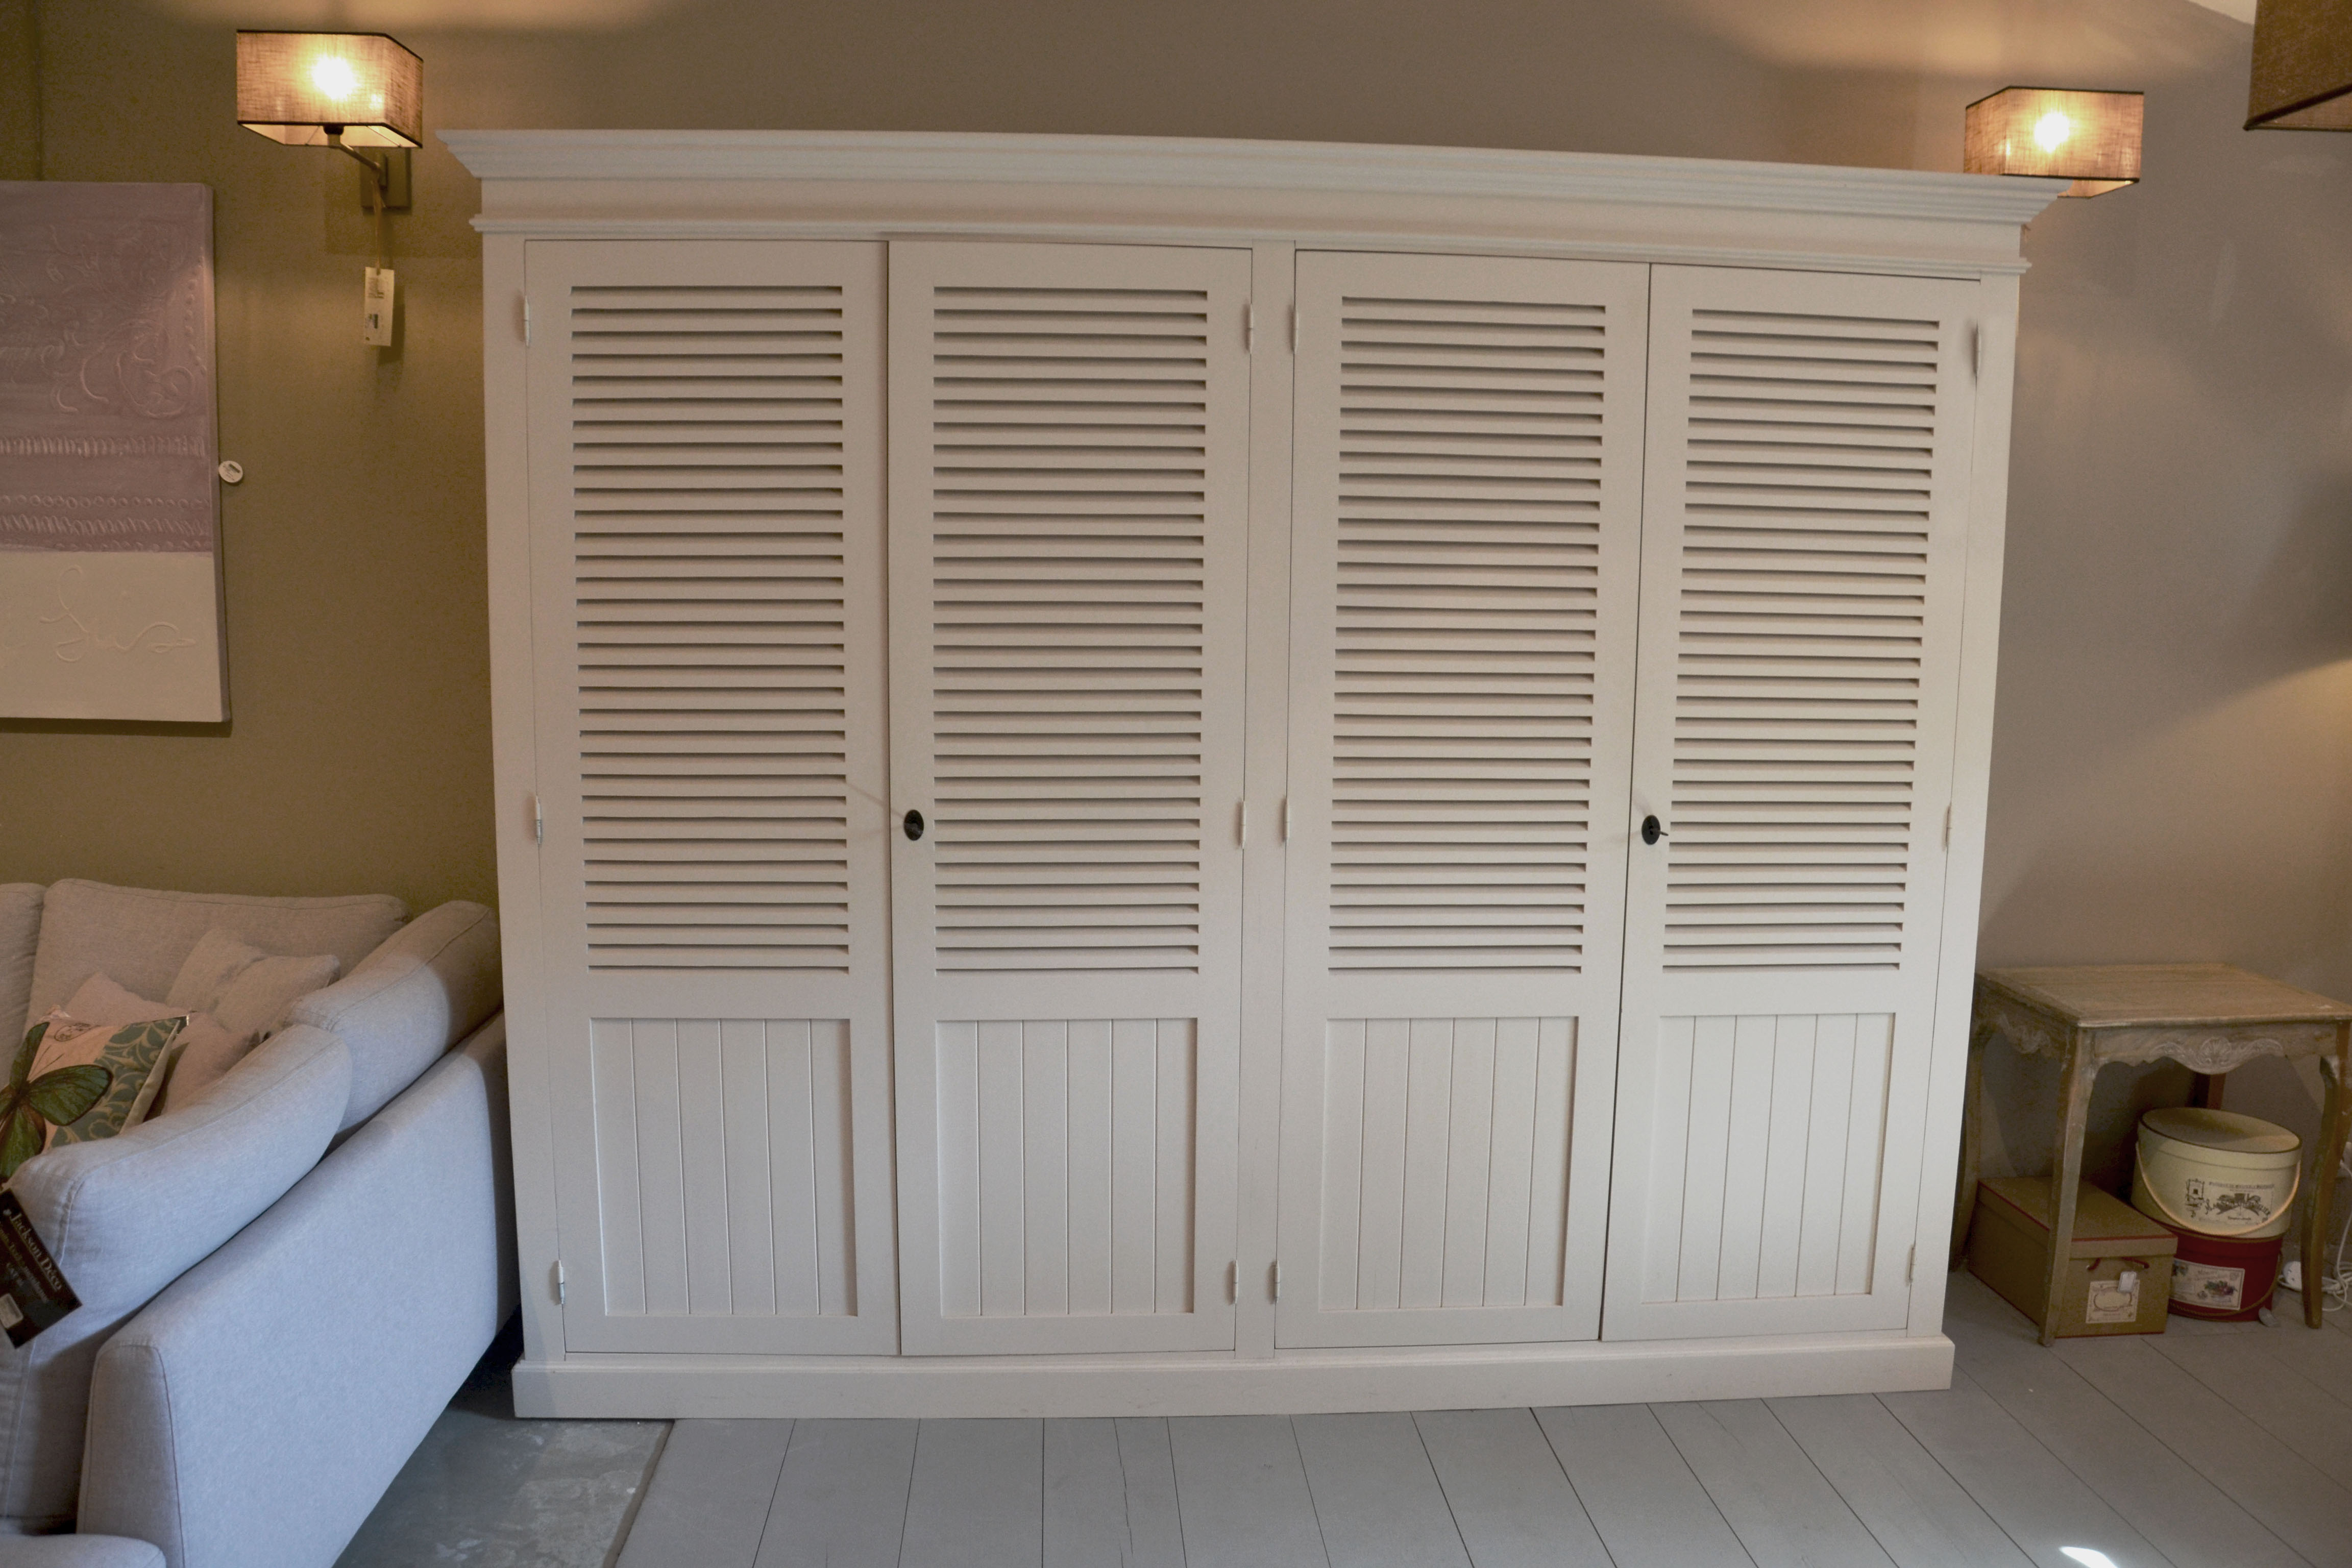 garde robe blanche jackson jackson d co. Black Bedroom Furniture Sets. Home Design Ideas